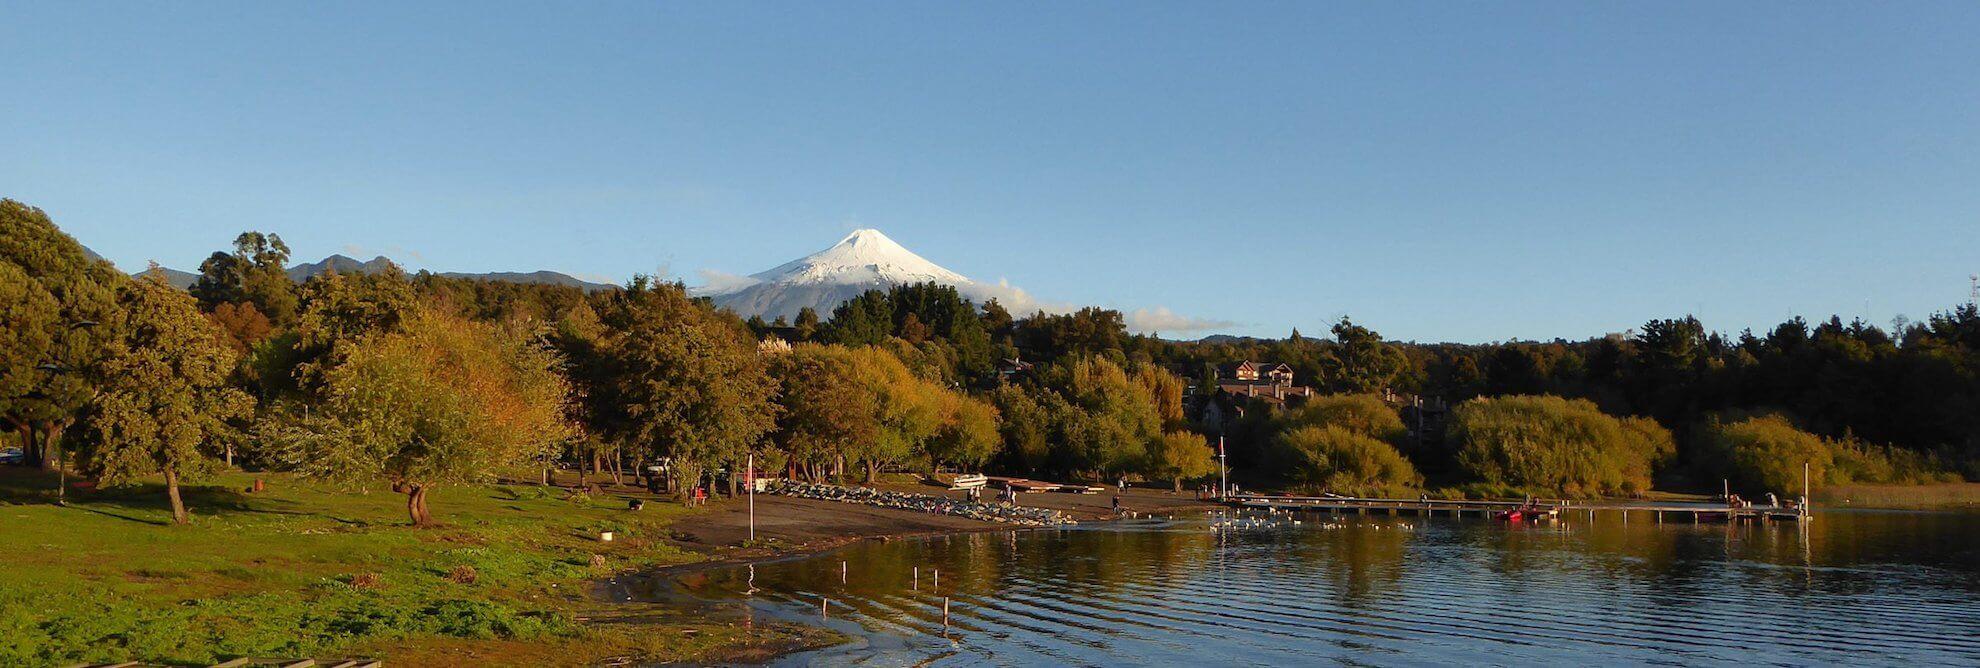 Chilenische Schweiz - Villarrica Vulkan, Pucon